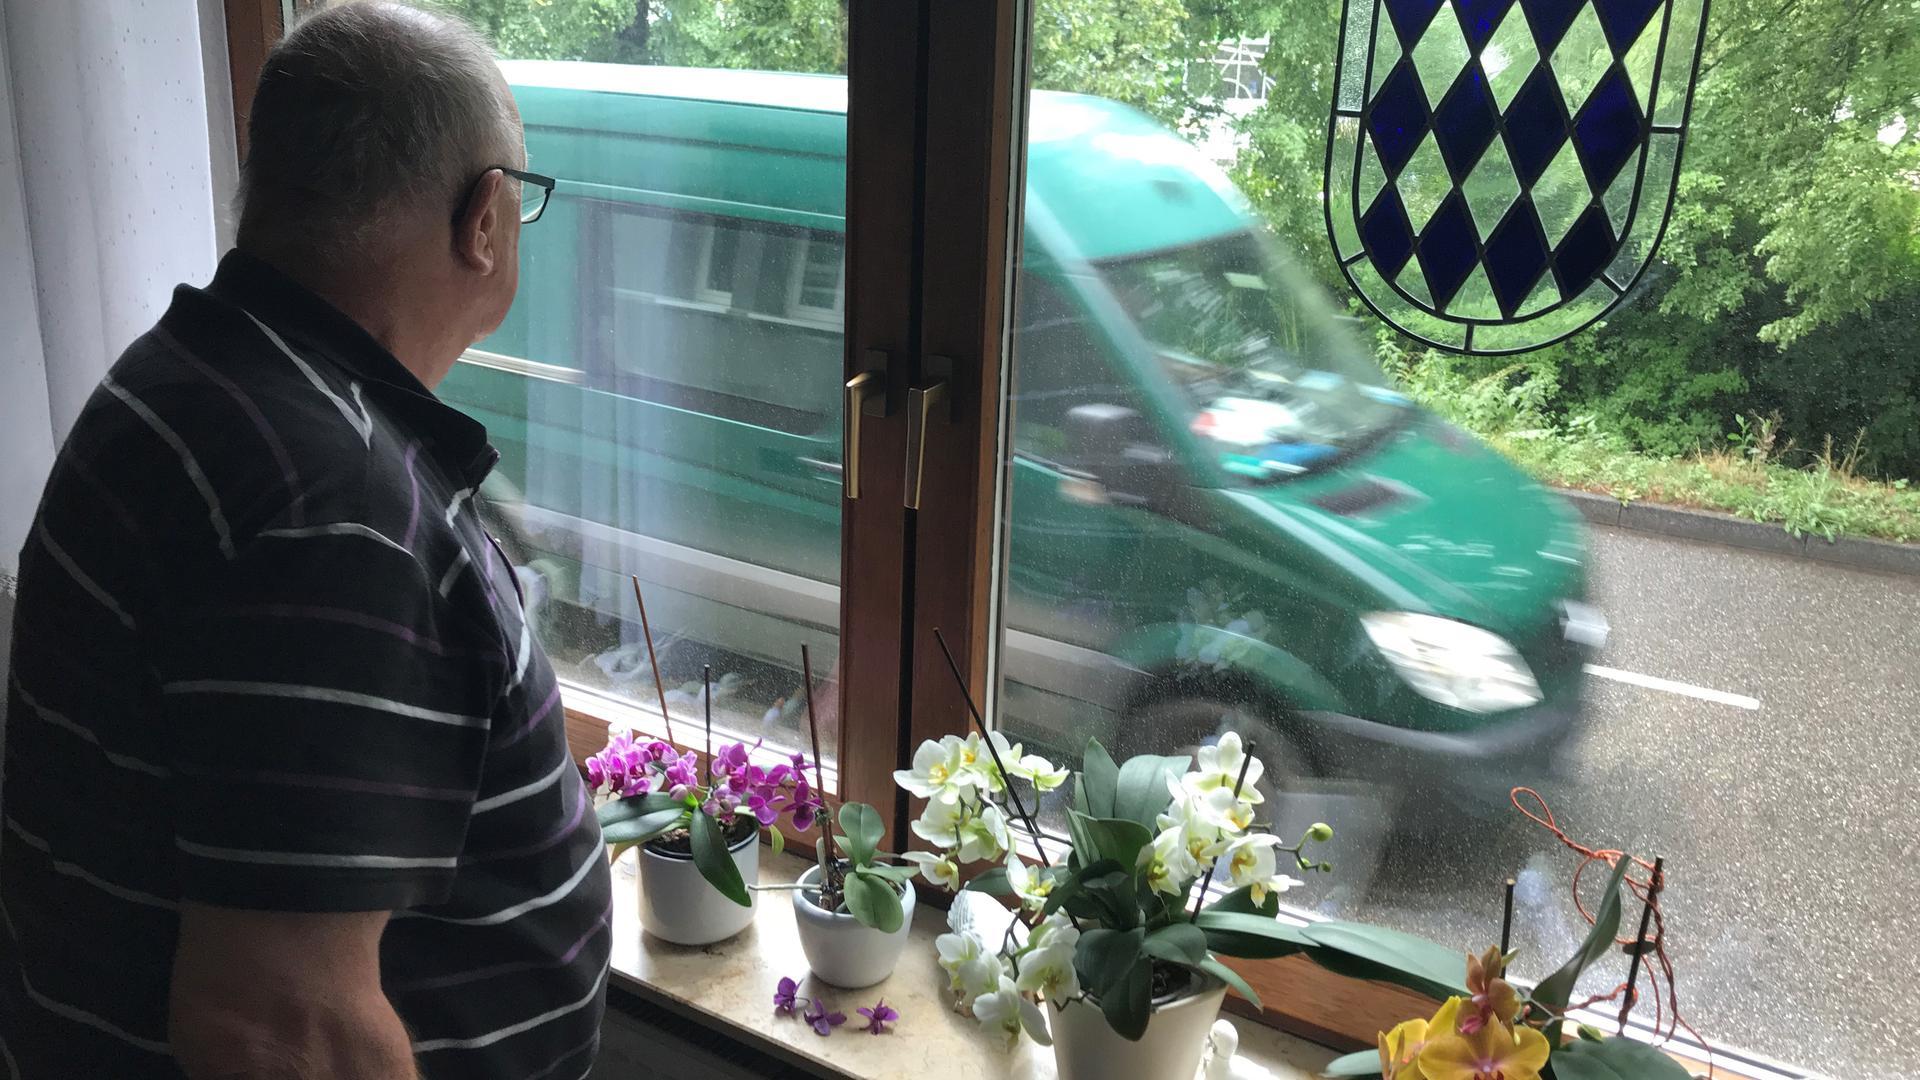 Mann schaut aus Fenster